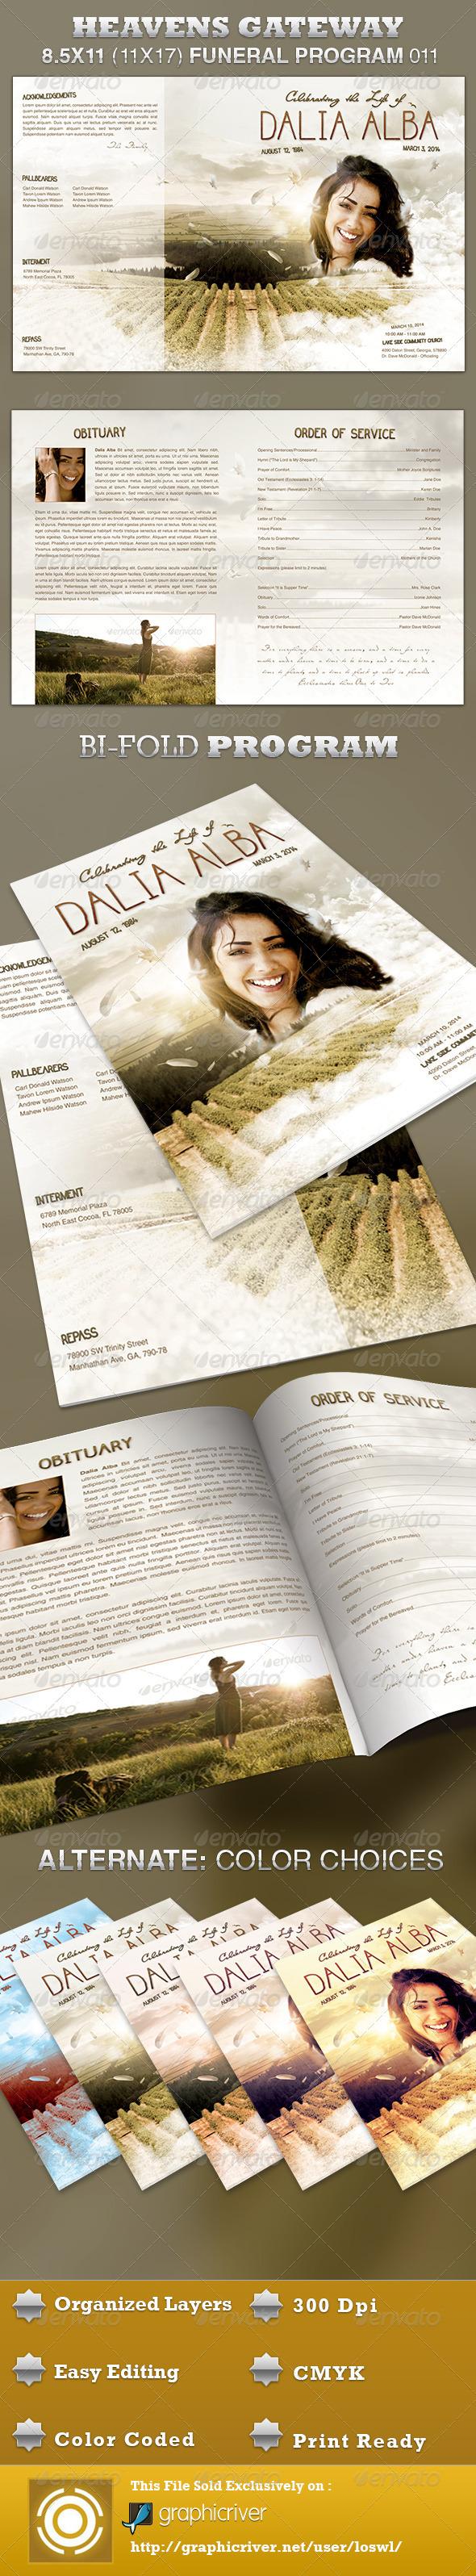 GraphicRiver Heavens Gateway Funeral Program Template 011 3977700